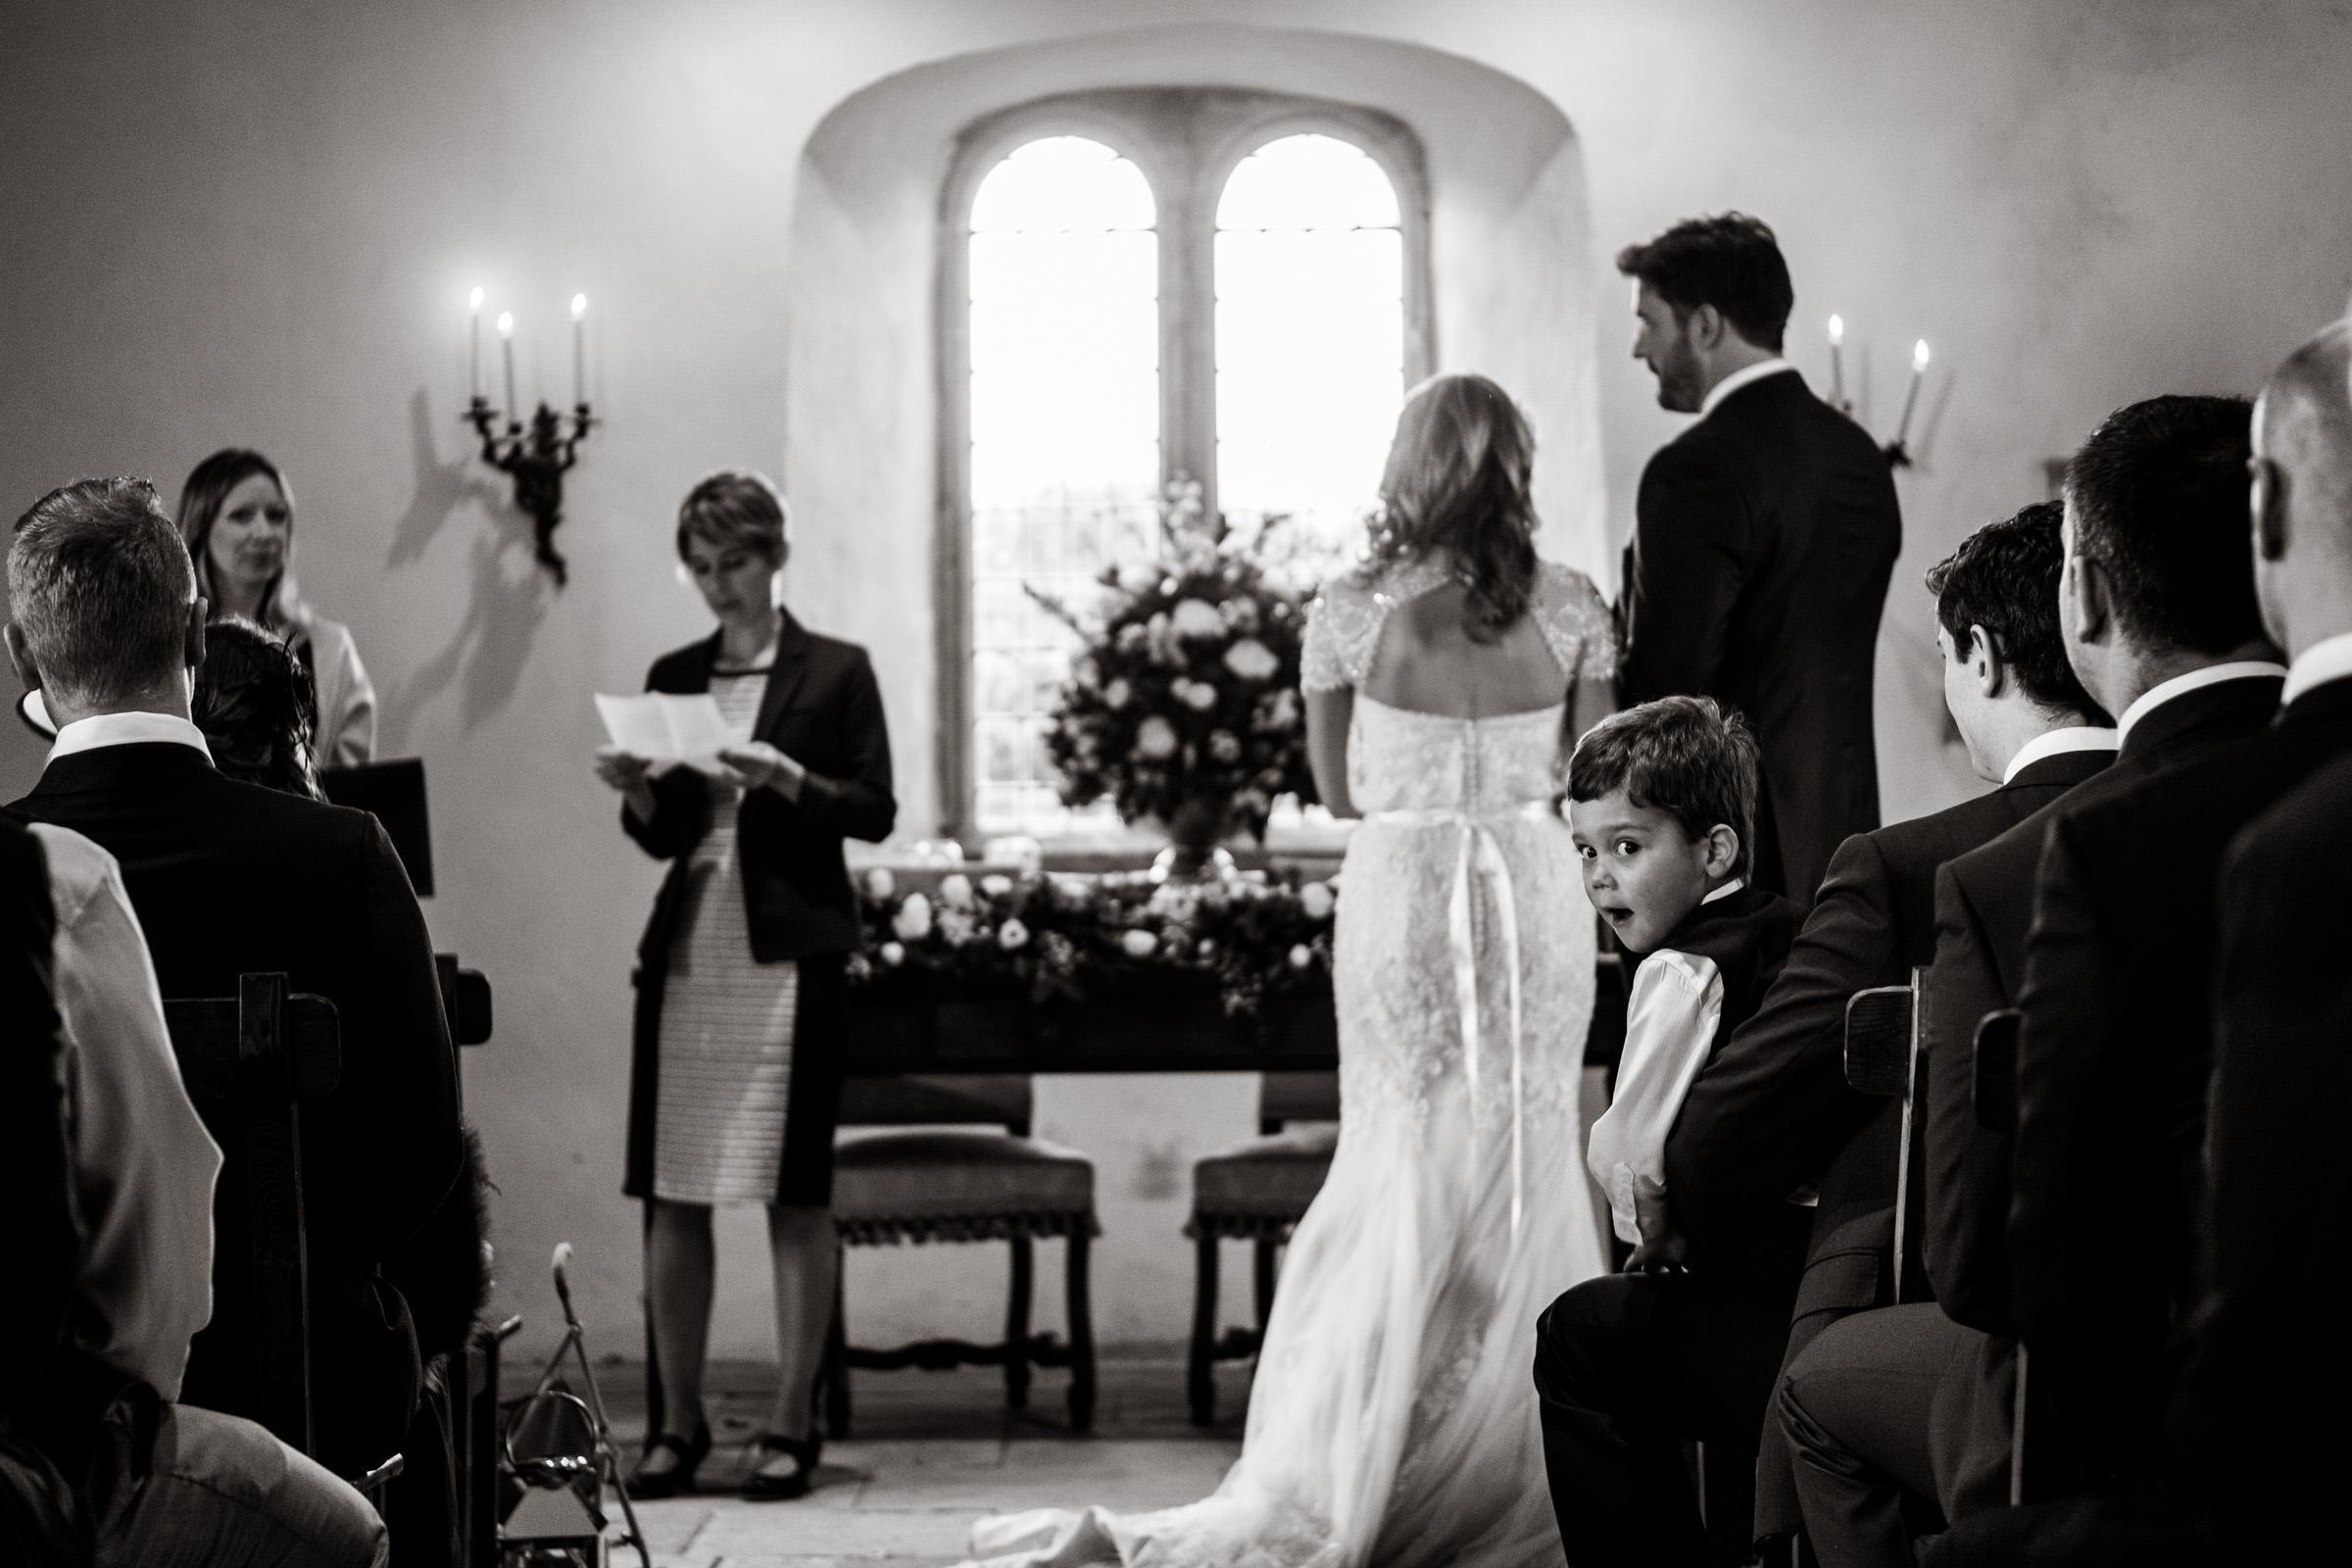 Brympton+House+Wedding+Photos+Somerset+010.jpg